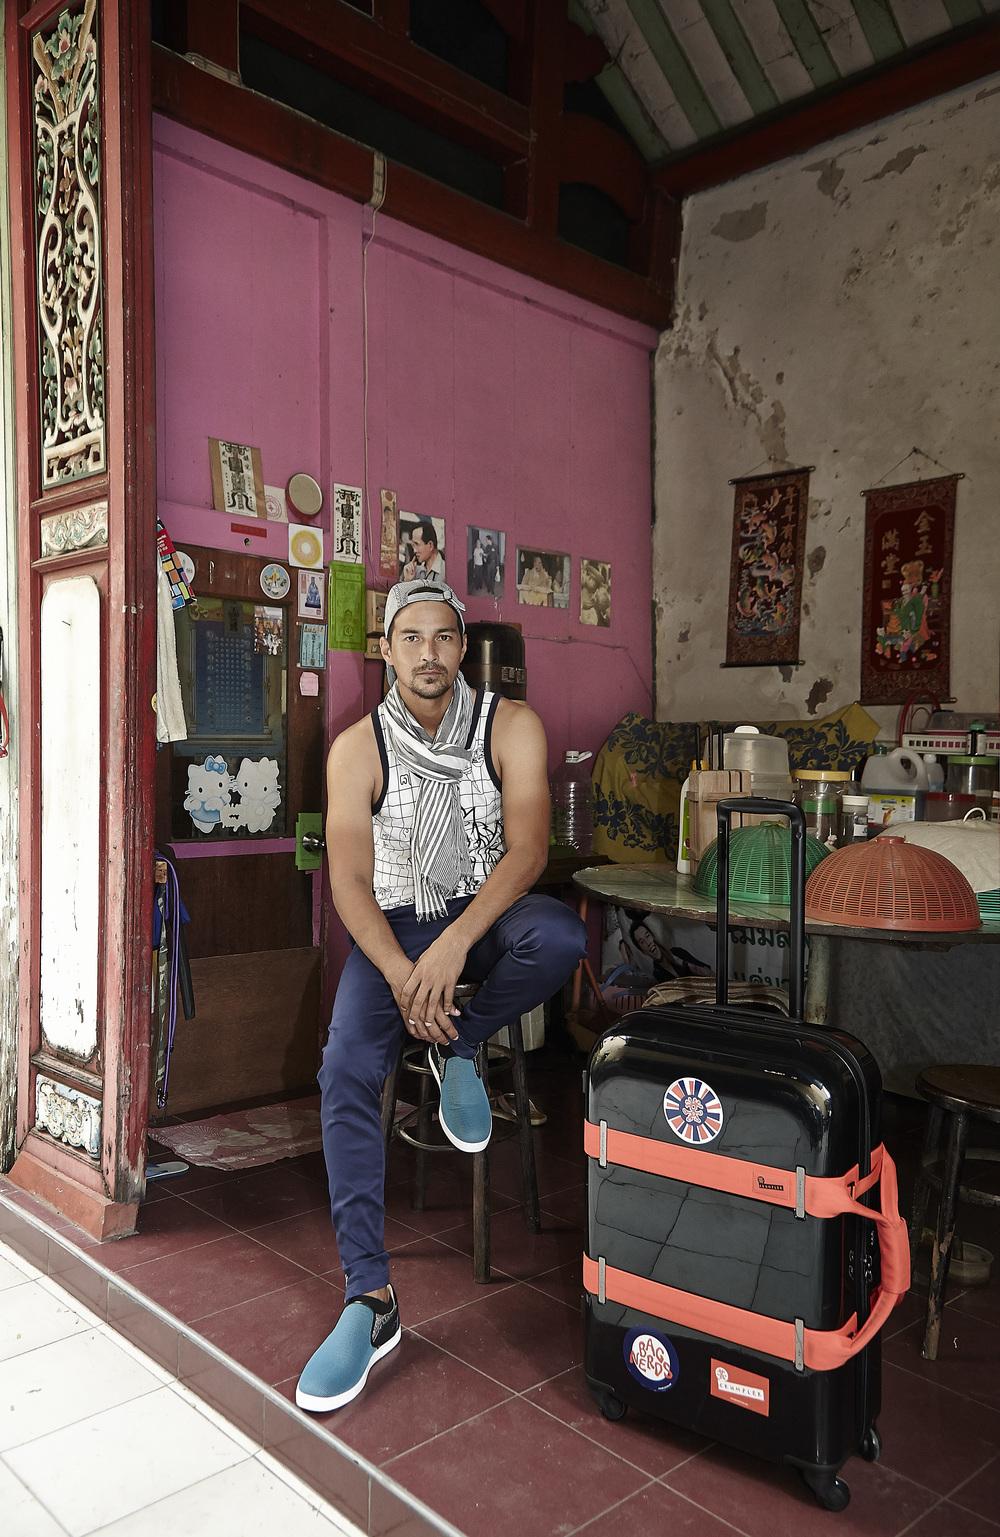 Tank top: Singha life / Pants: Playhound / Shoes: Christian Louboutin / Luggage: Crumpler